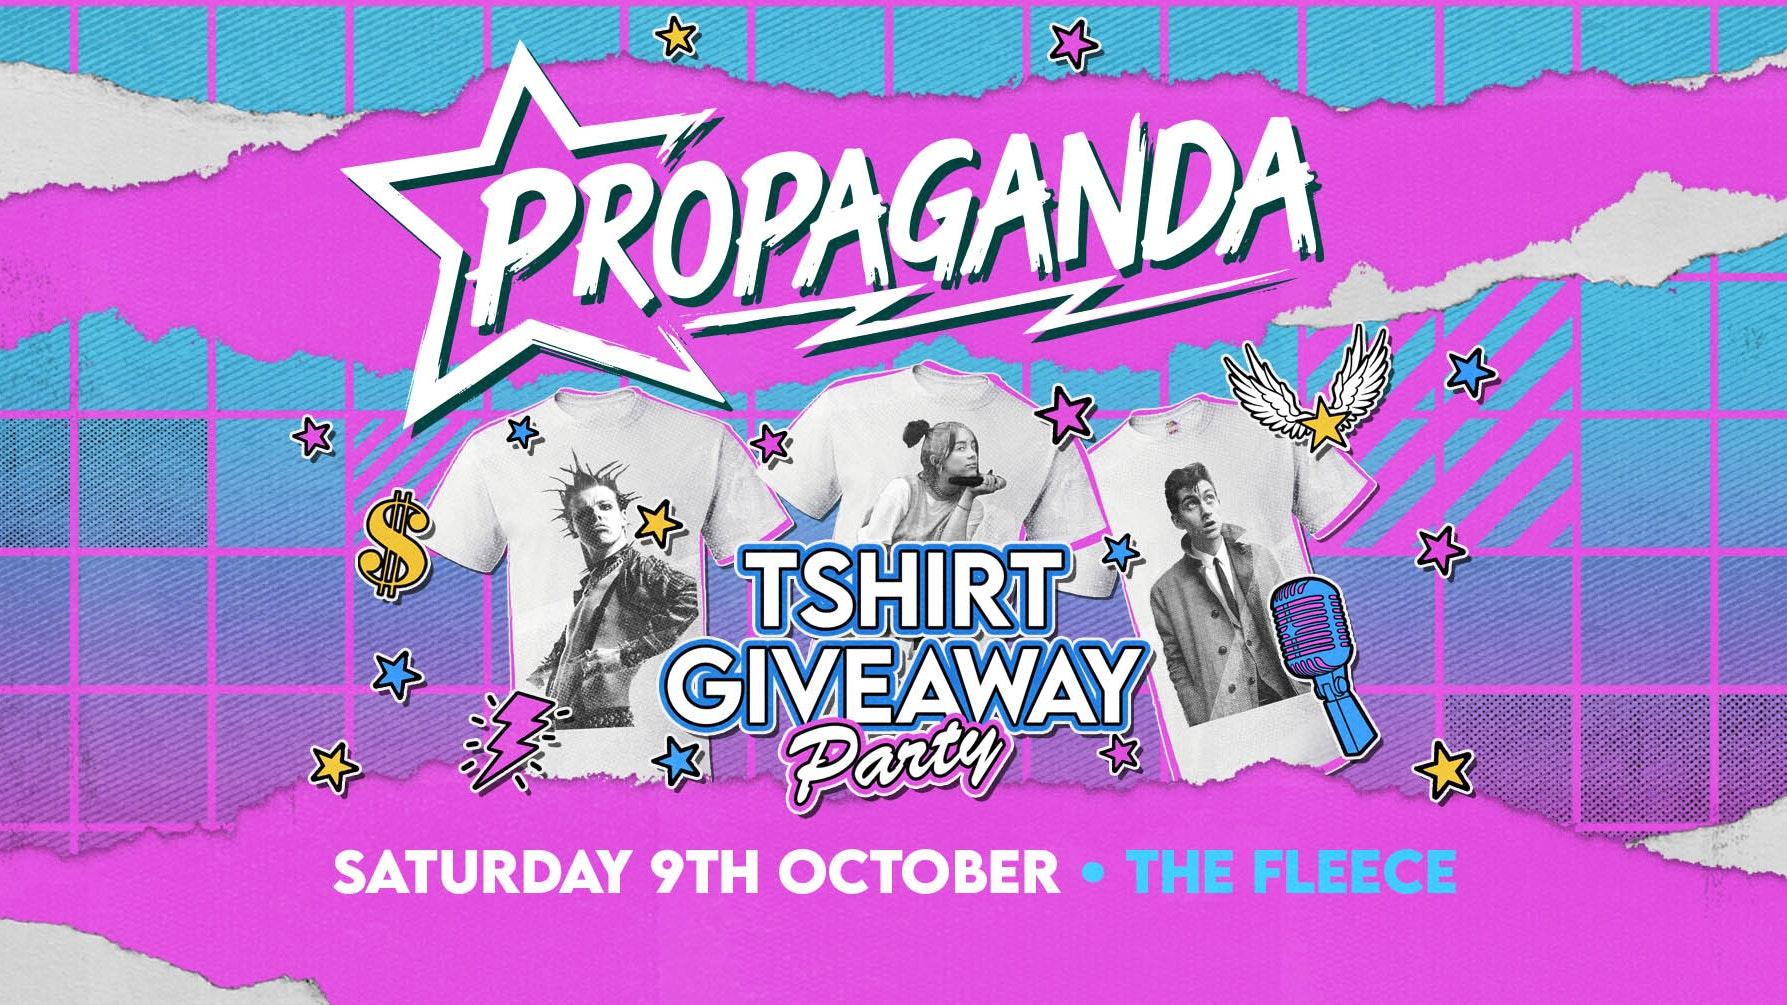 Propaganda Bristol – T-shirt Party!